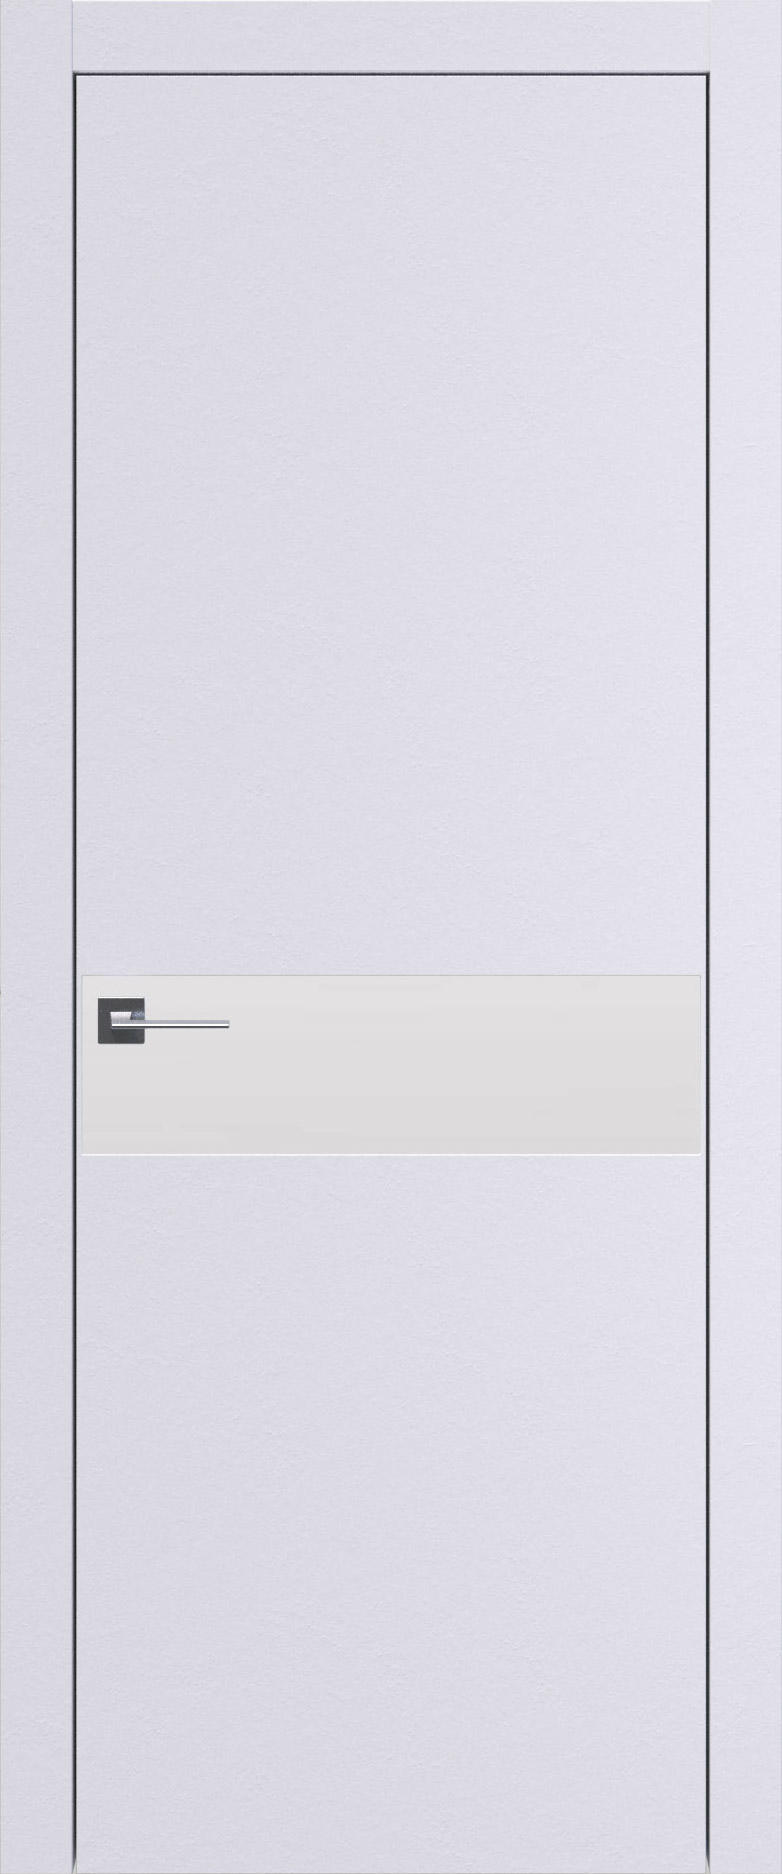 Tivoli И-4 цвет - Арктик белый Без стекла (ДГ)